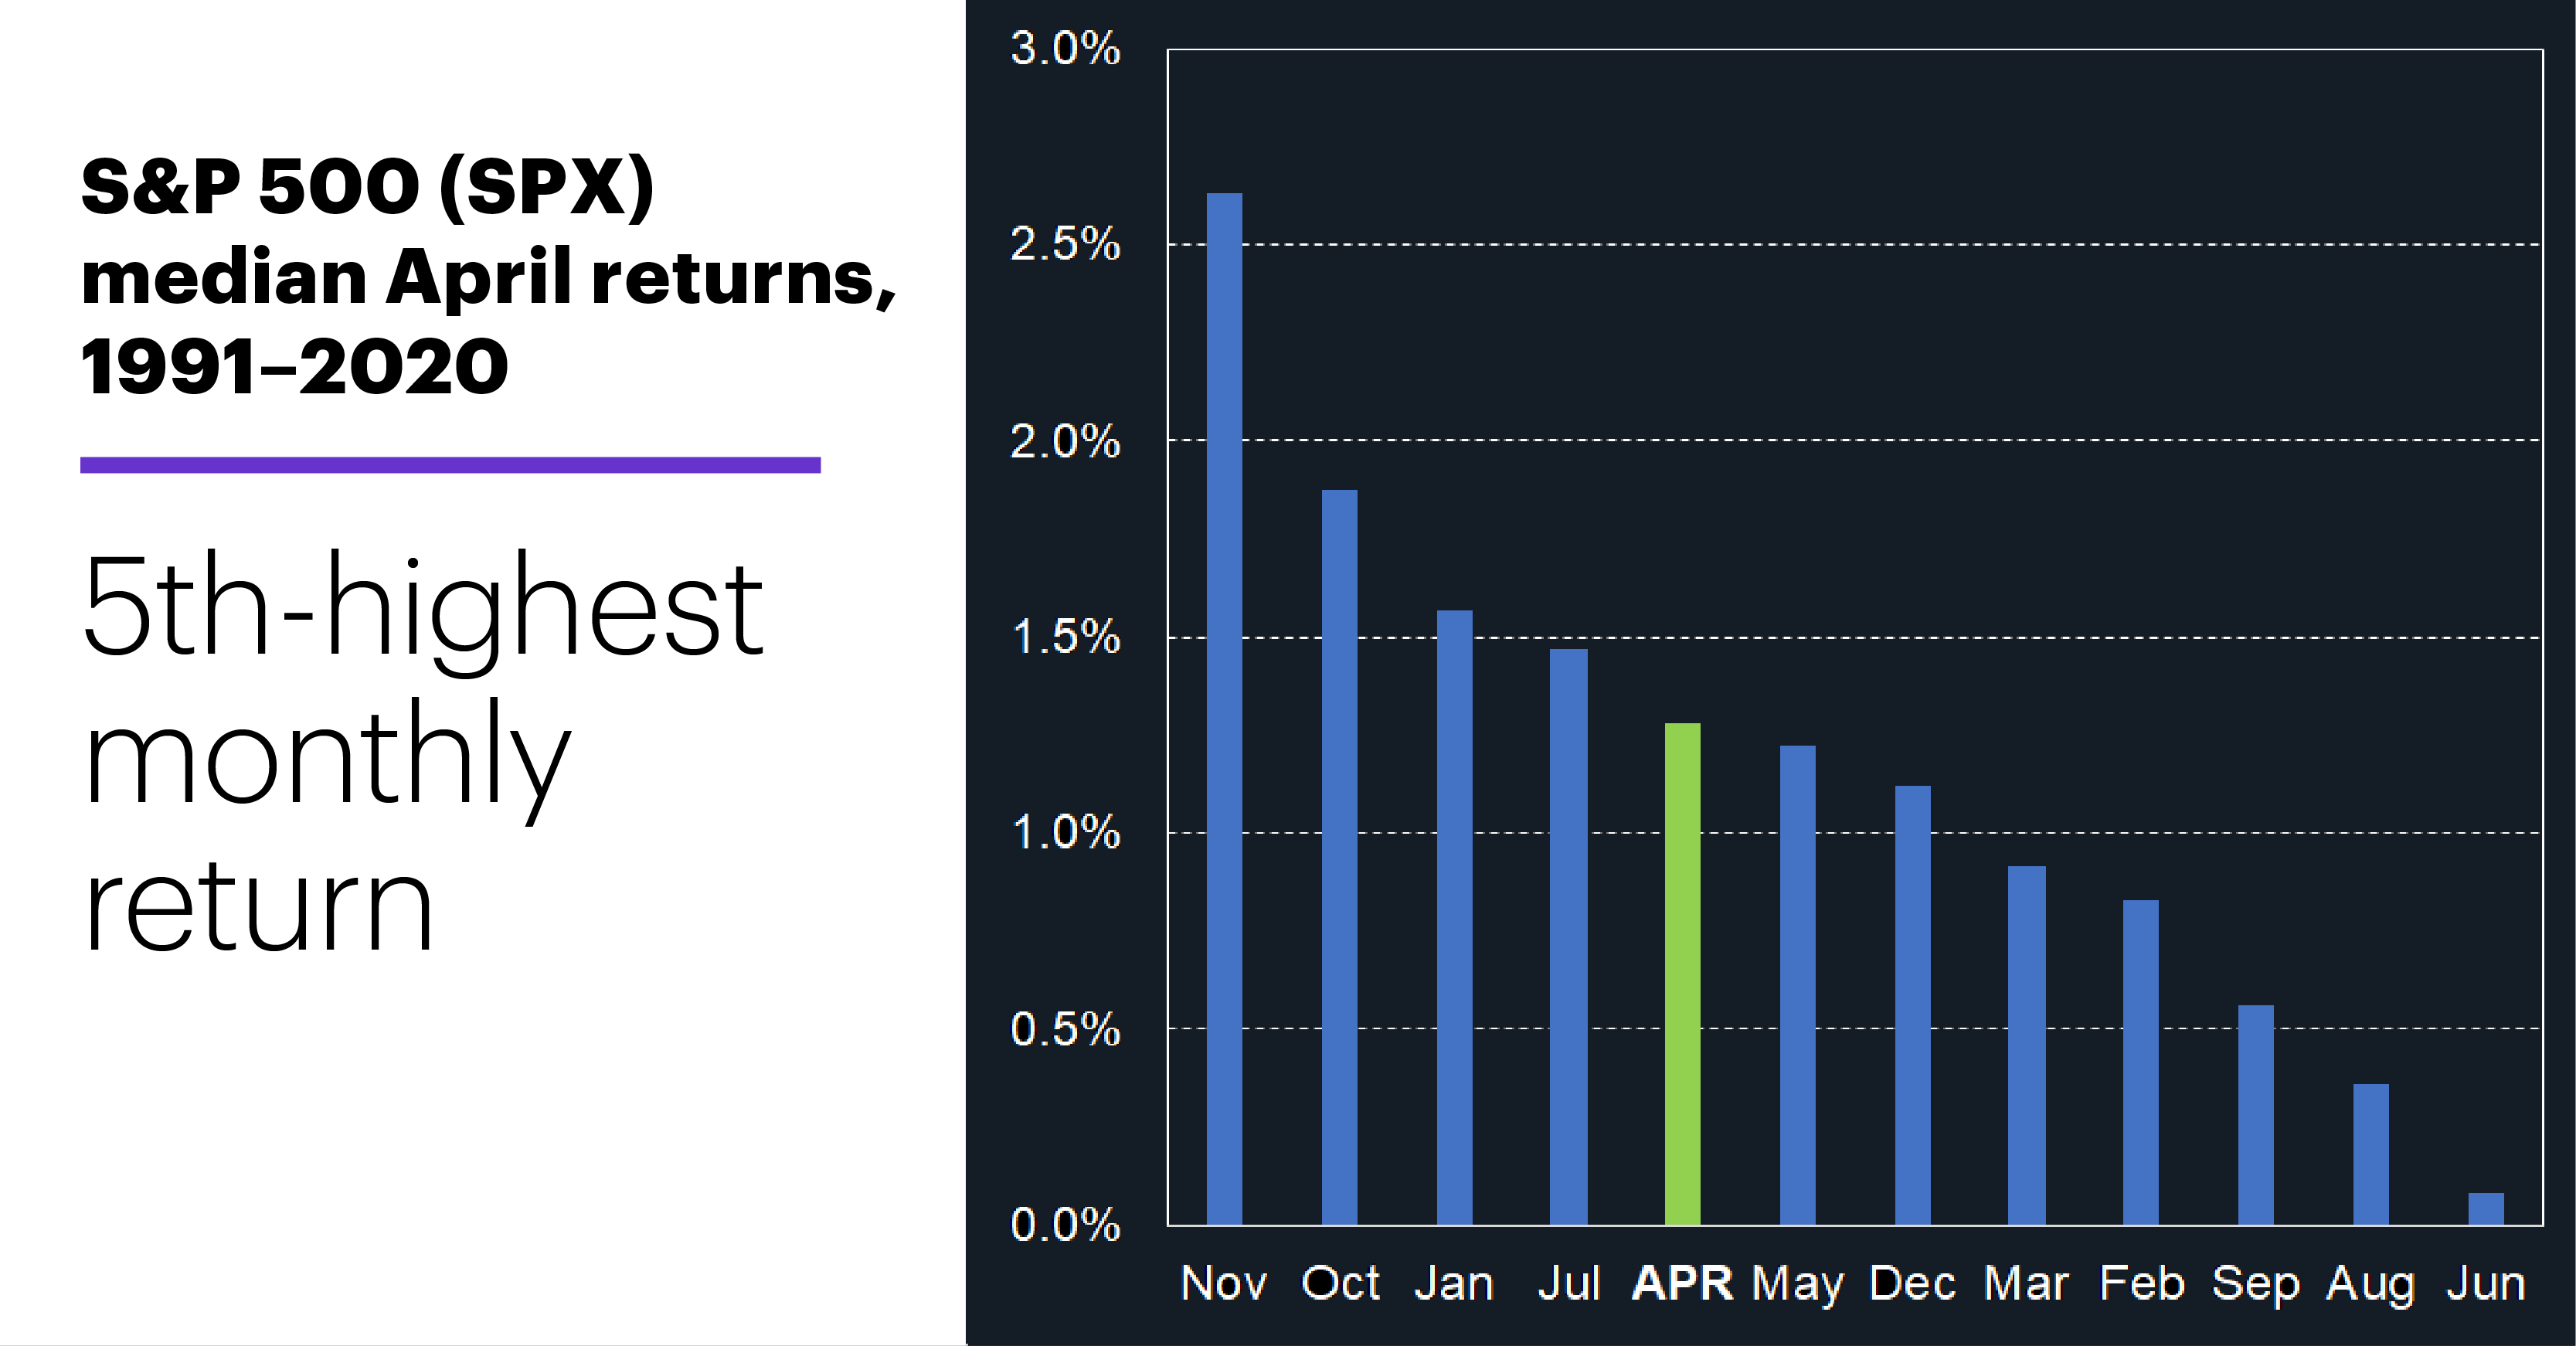 Chart 2: S&P 500 (SPX) median April returns, 1991–2020. S&P 500 historical performance. 5th-highest monthly return.